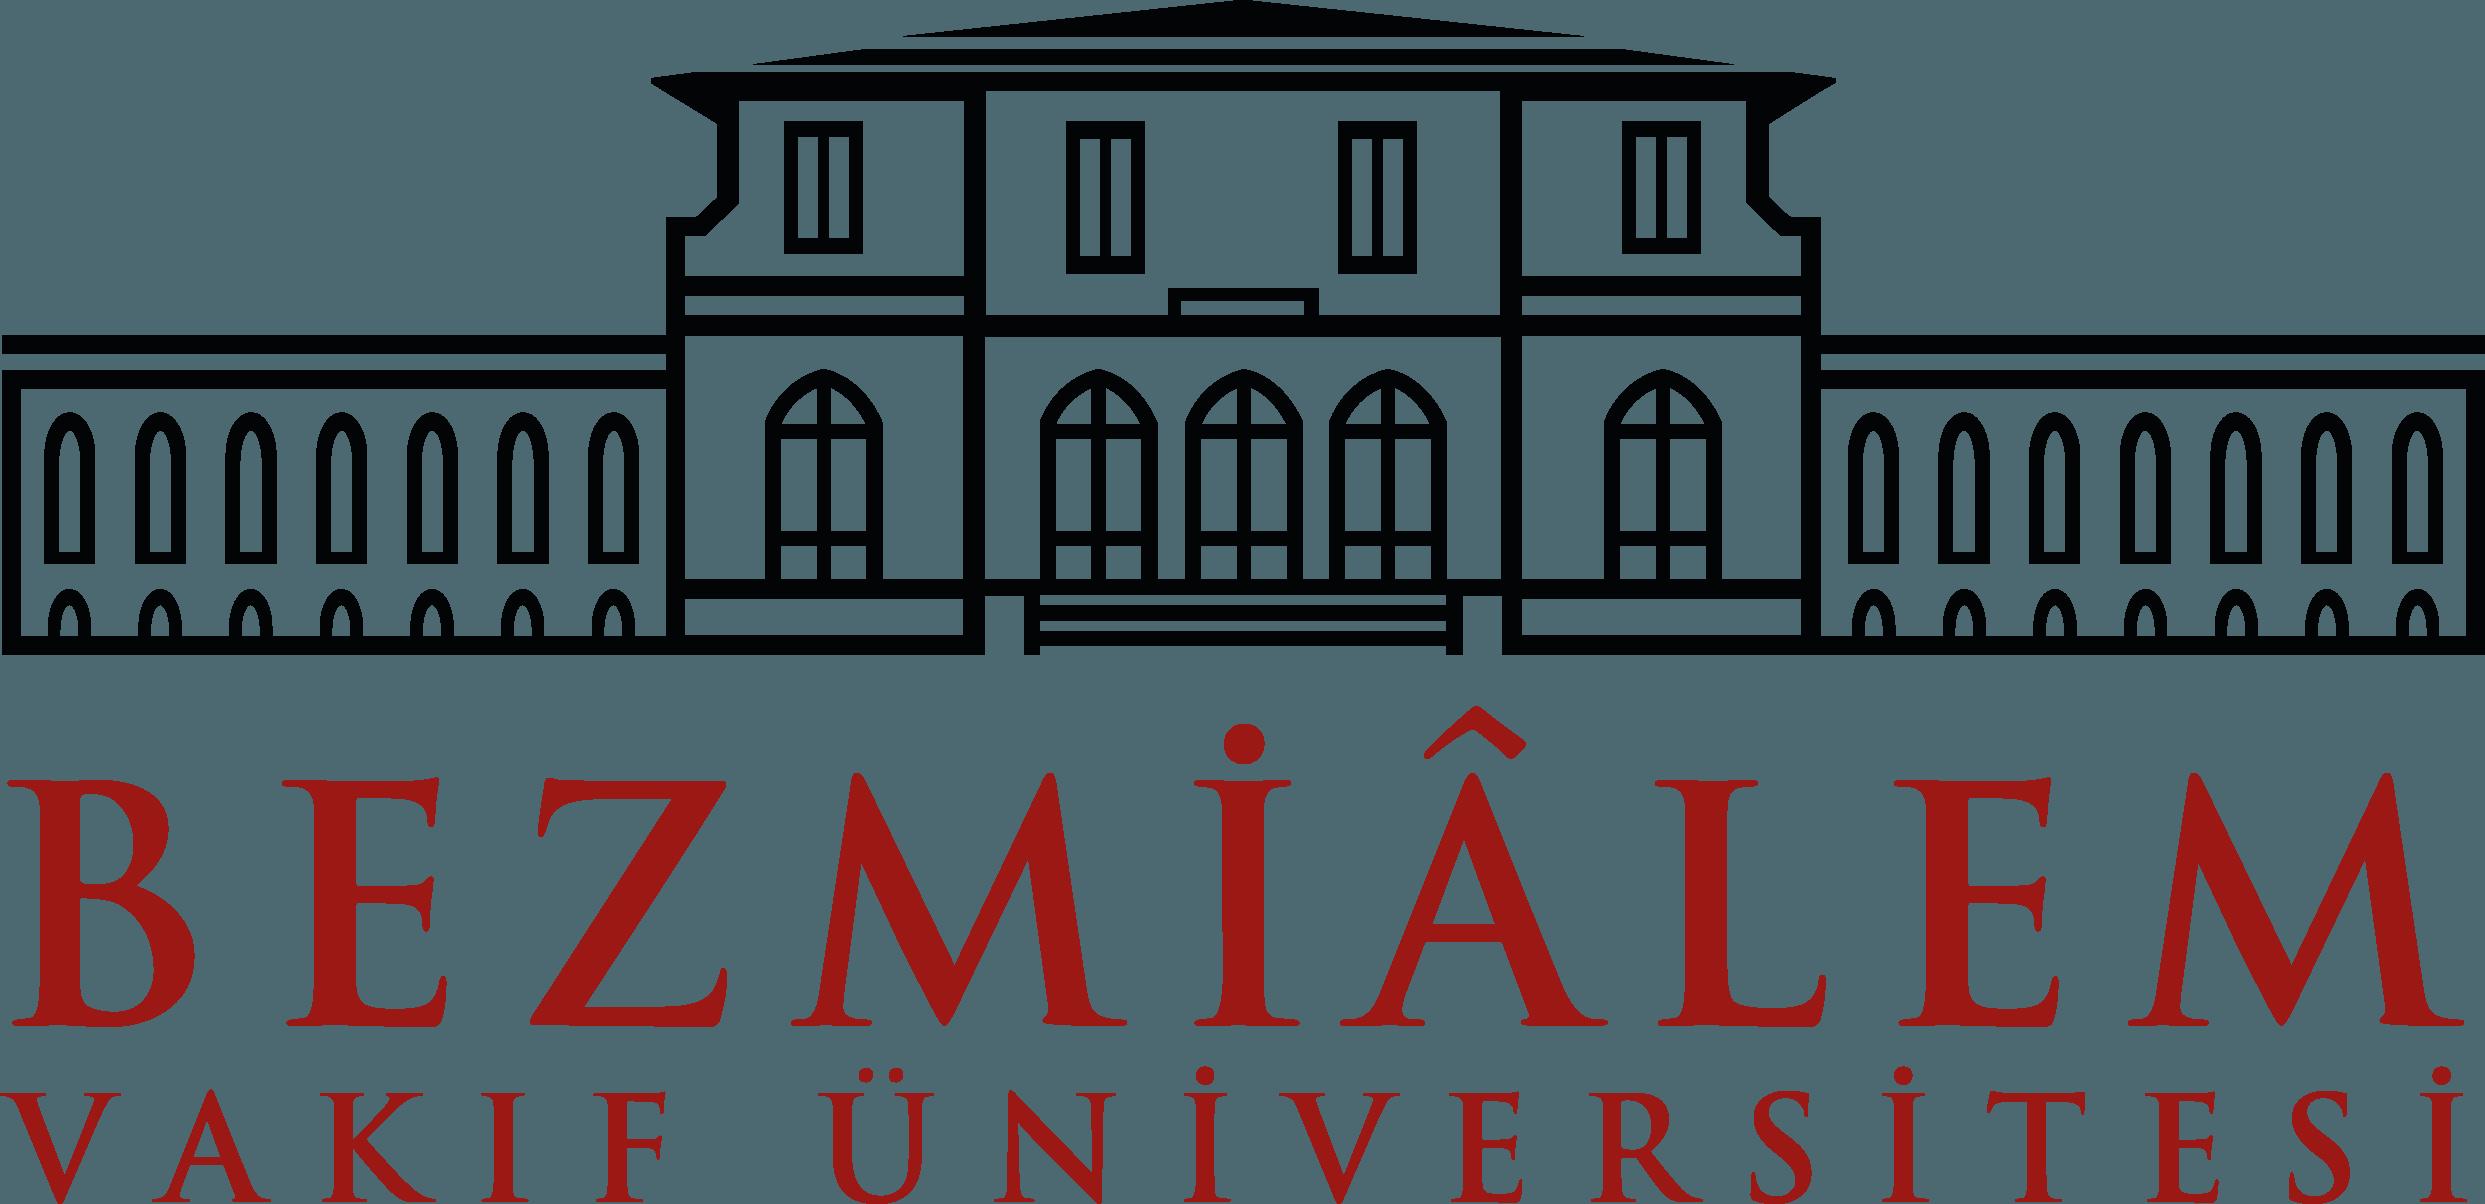 Bezmialem Vakıf Üniversitesi Logo   Arma png